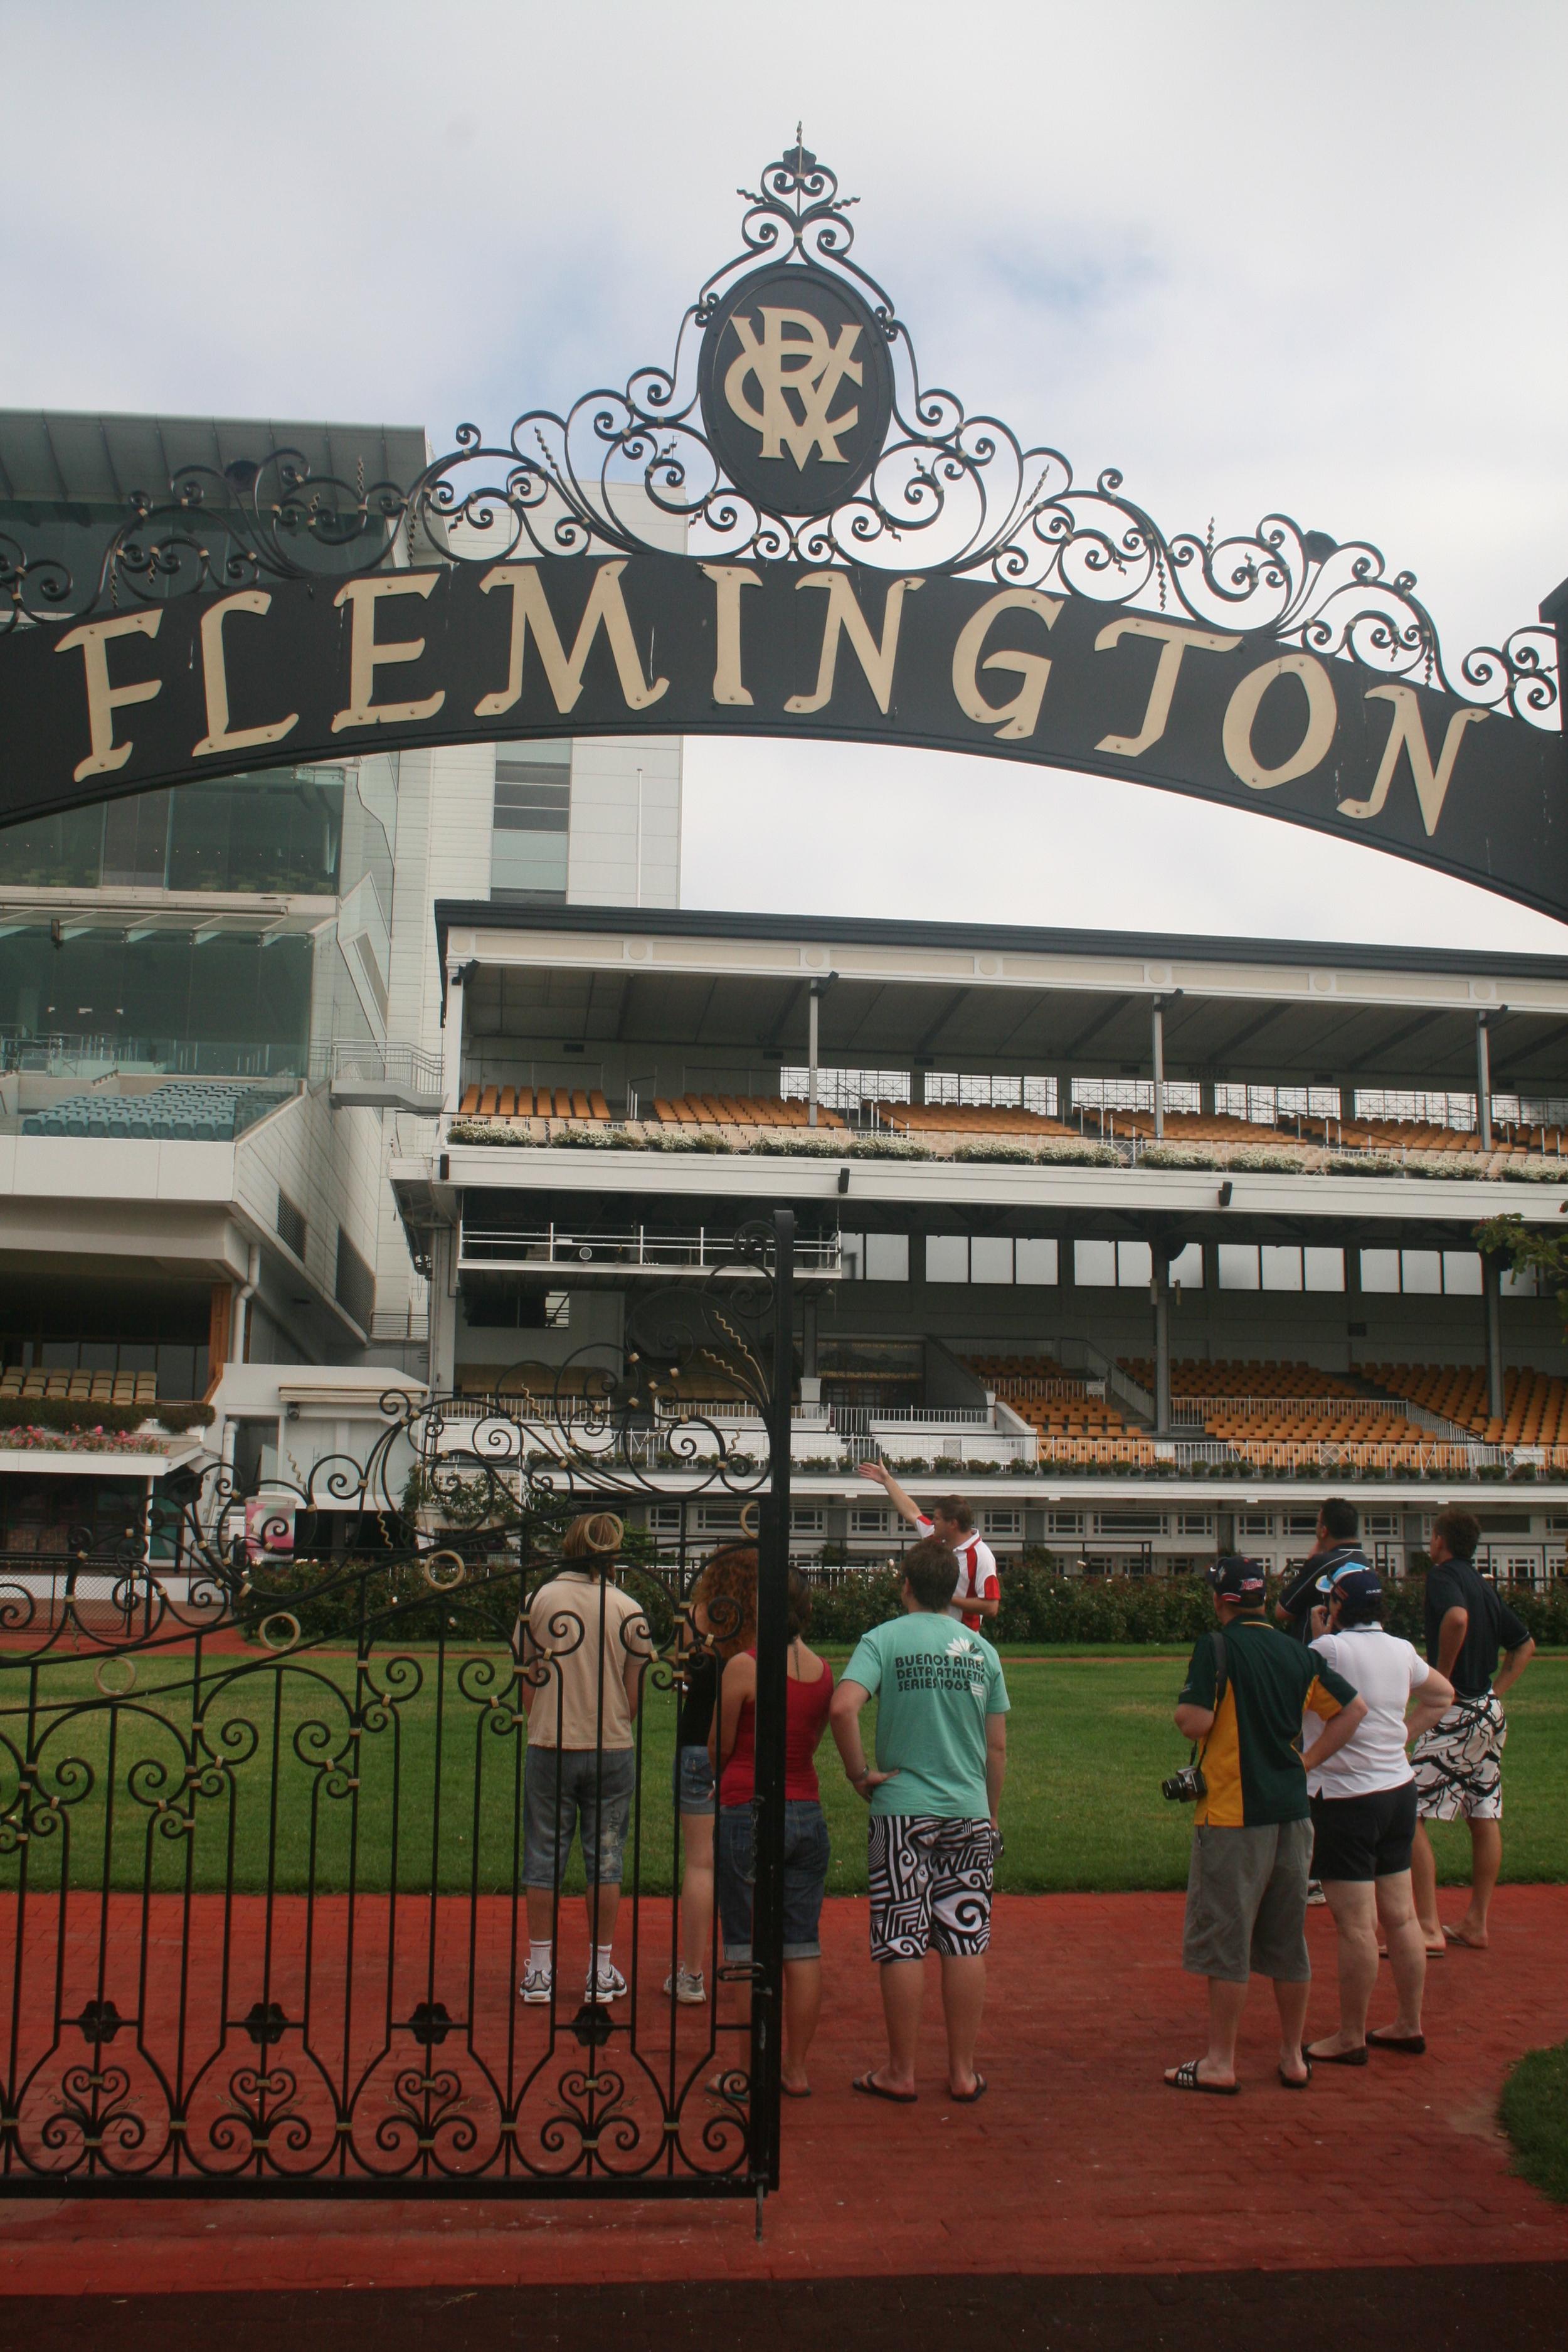 Flemington Feb 09 on tour 2.jpg